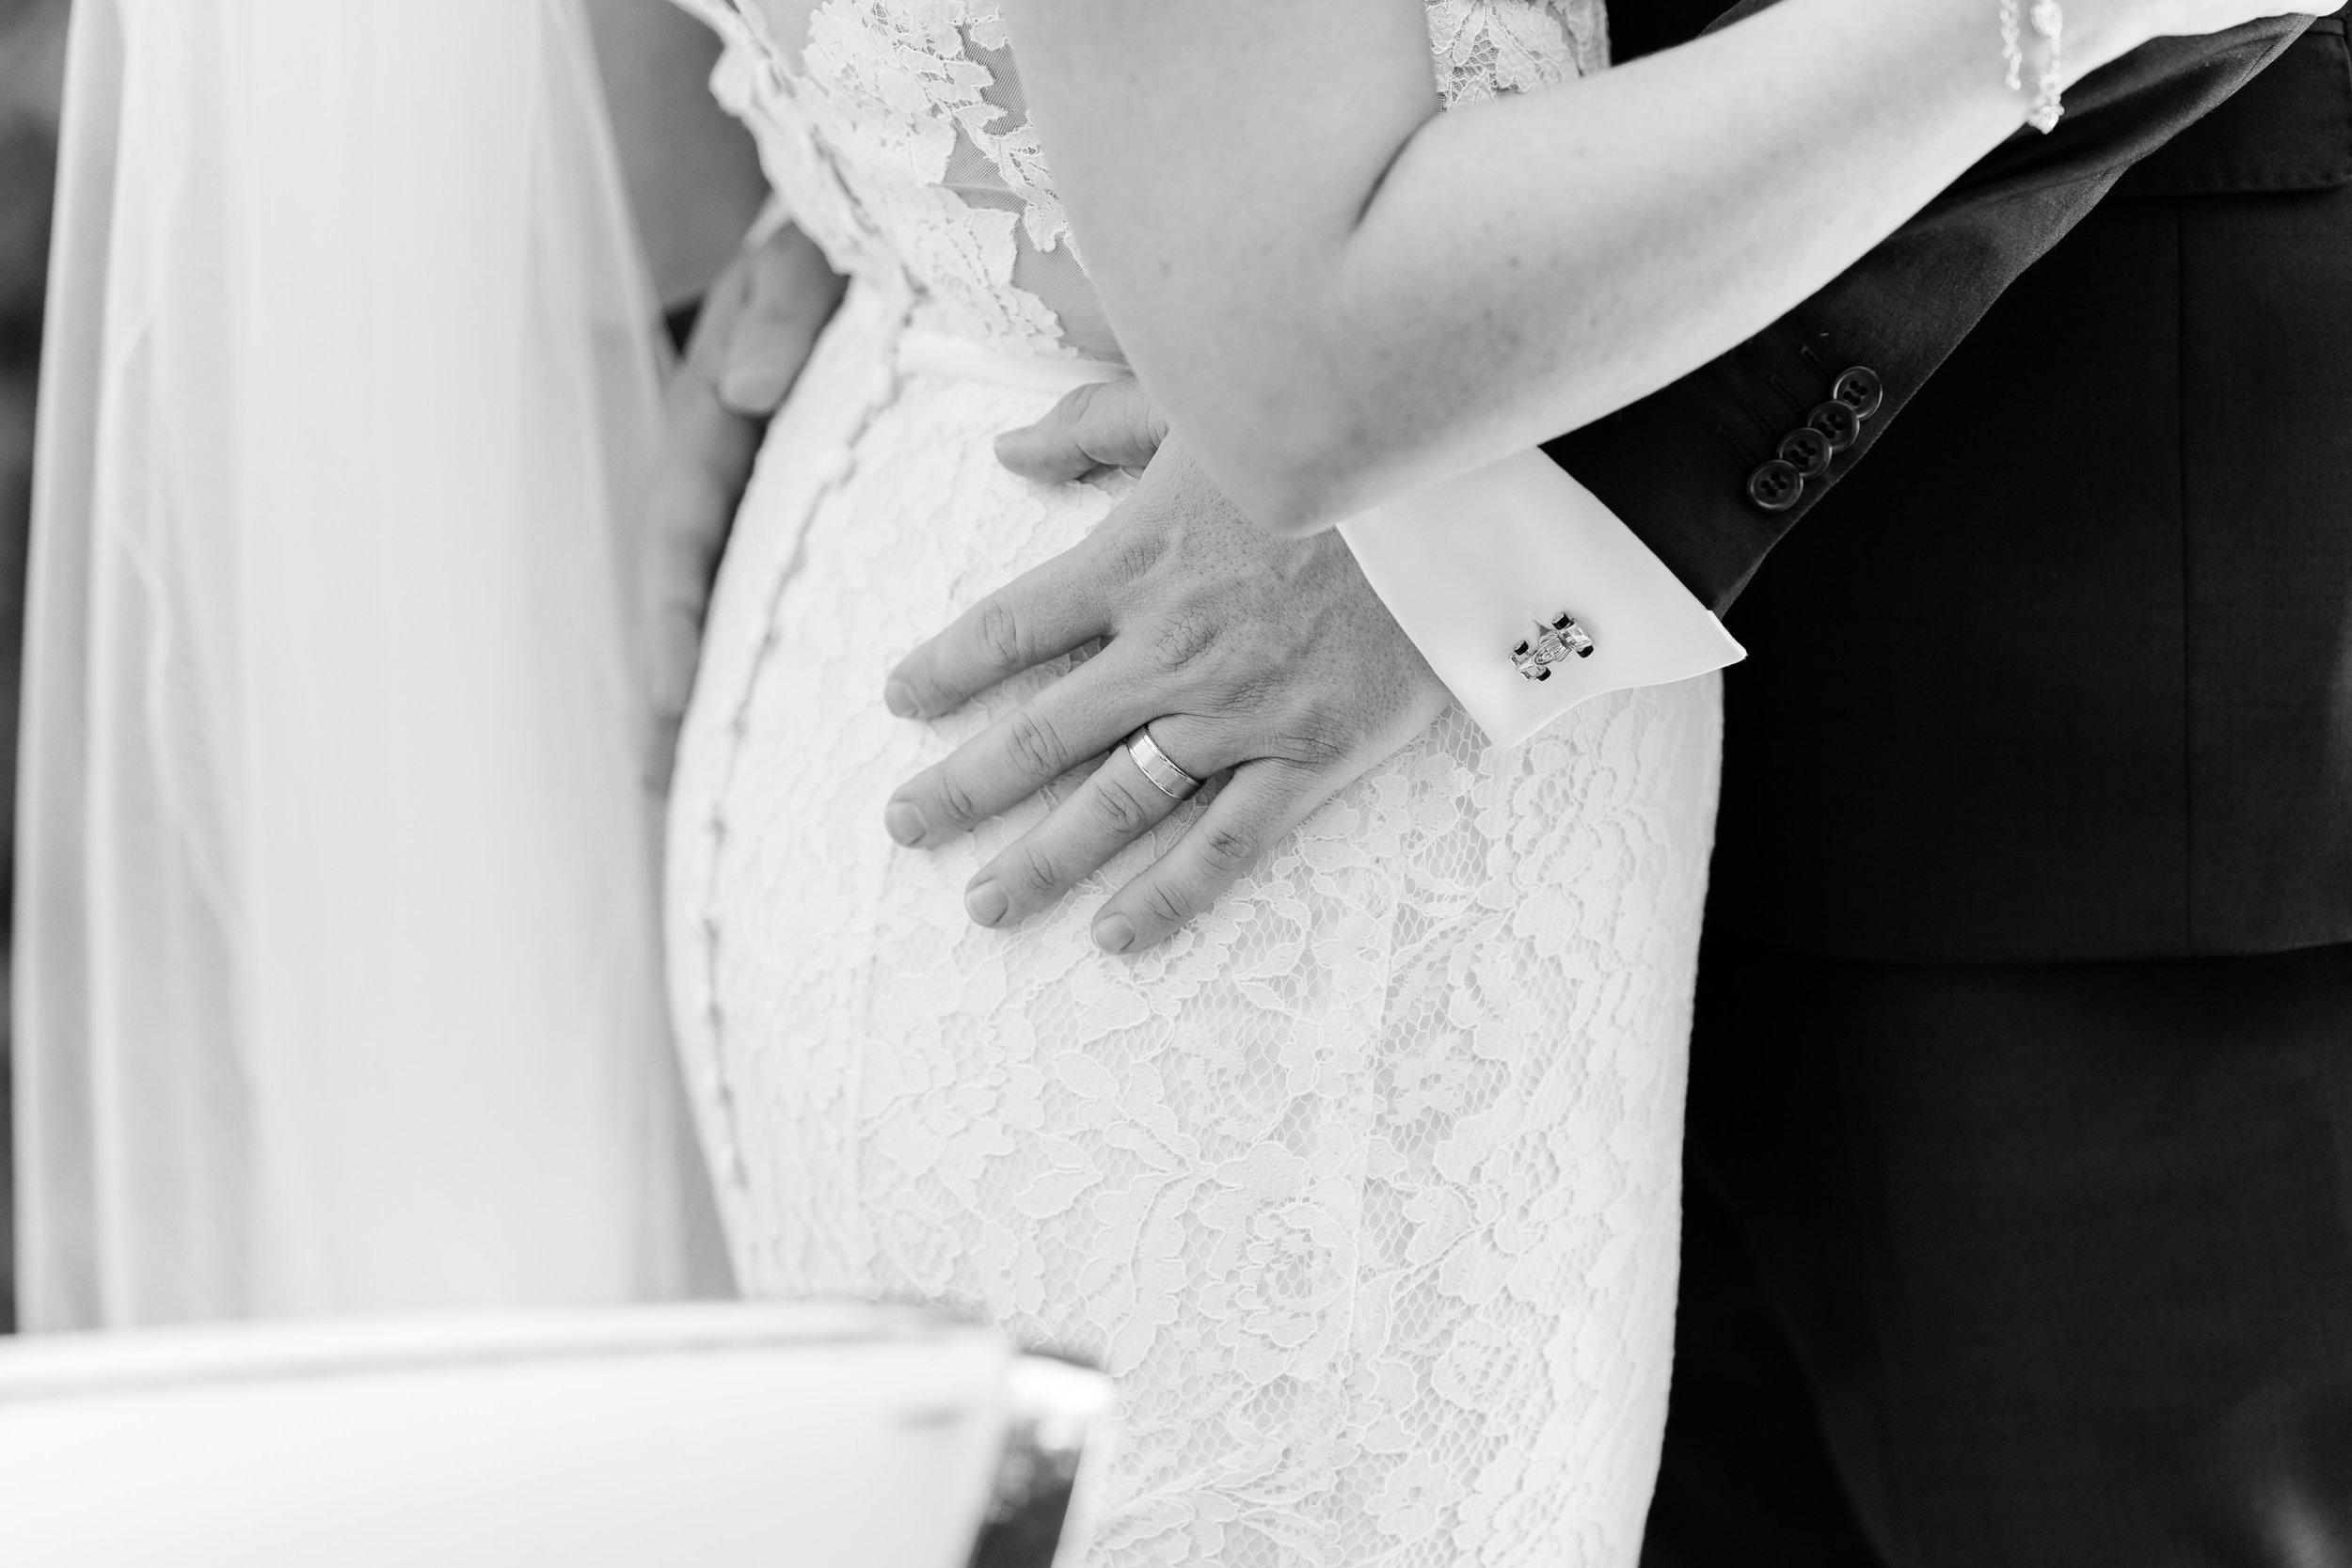 Justin_And_Jim_Photography_Chateau_Dore_Bendigo_Wedding62.JPG